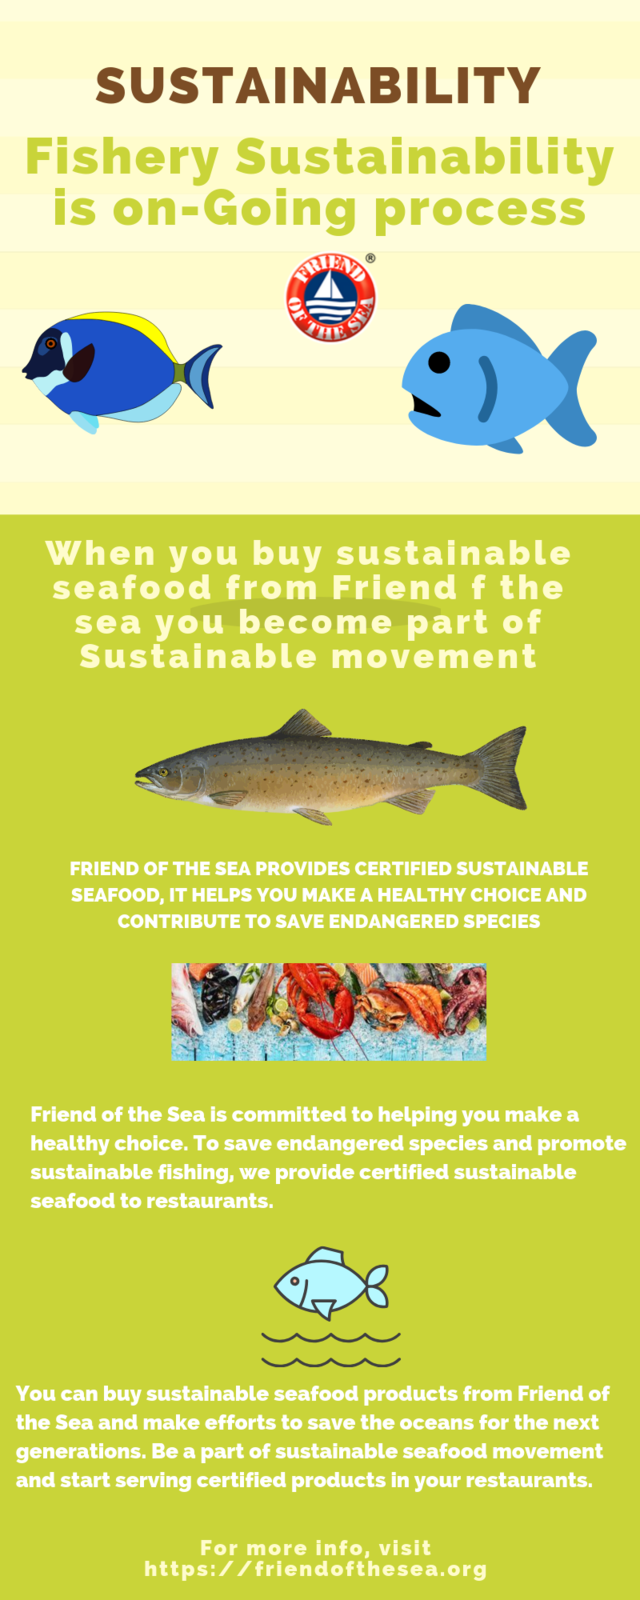 Sustainable fishery